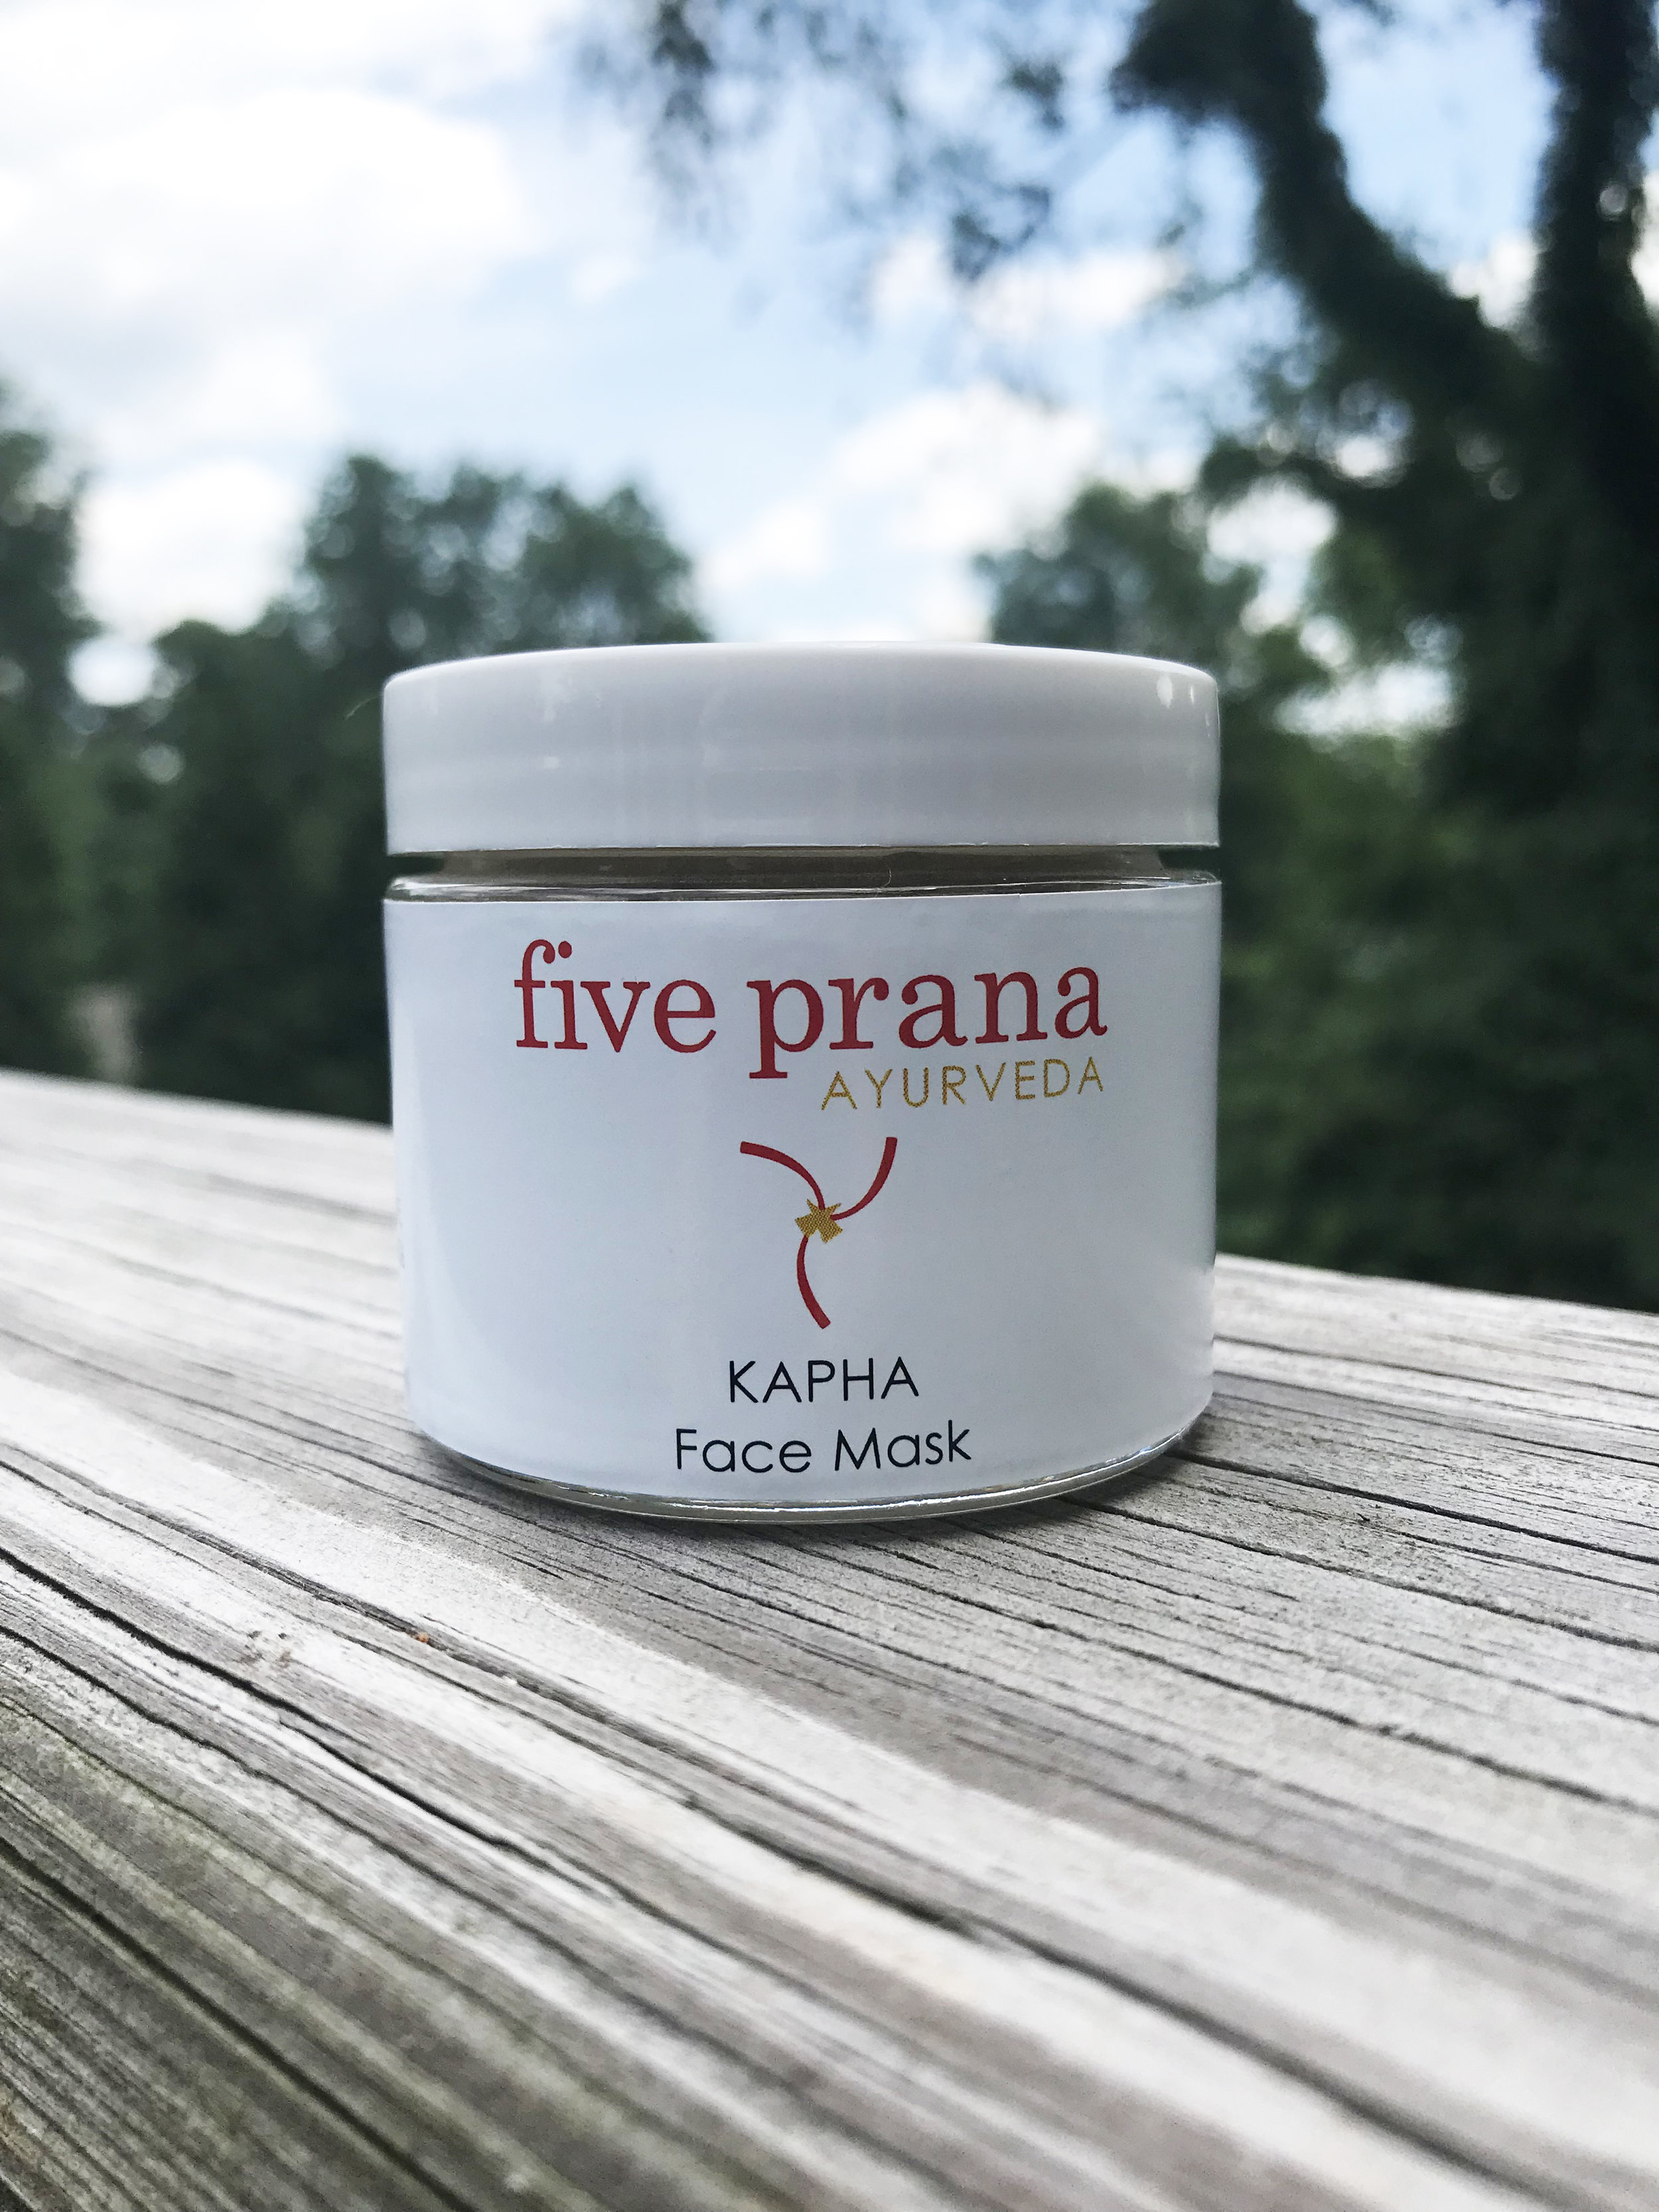 Five Prana Ayurveda Kapha Face Mask